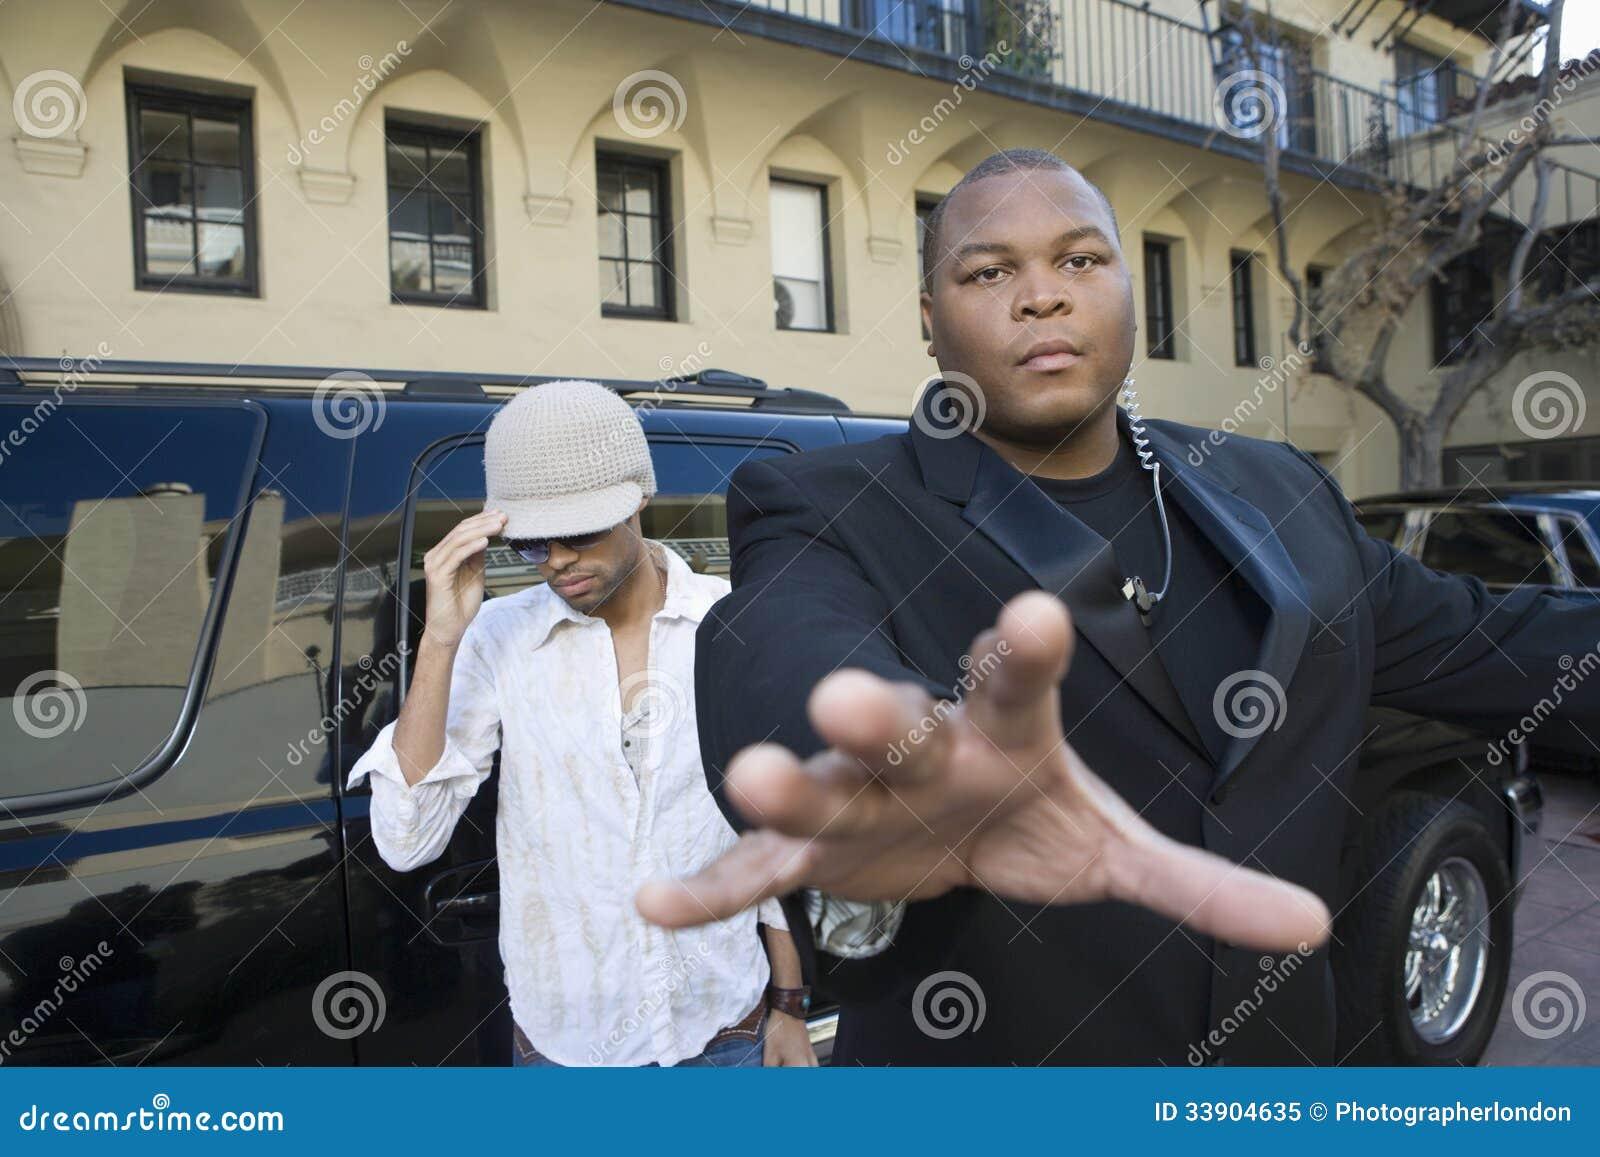 Pics free celebrity thumb